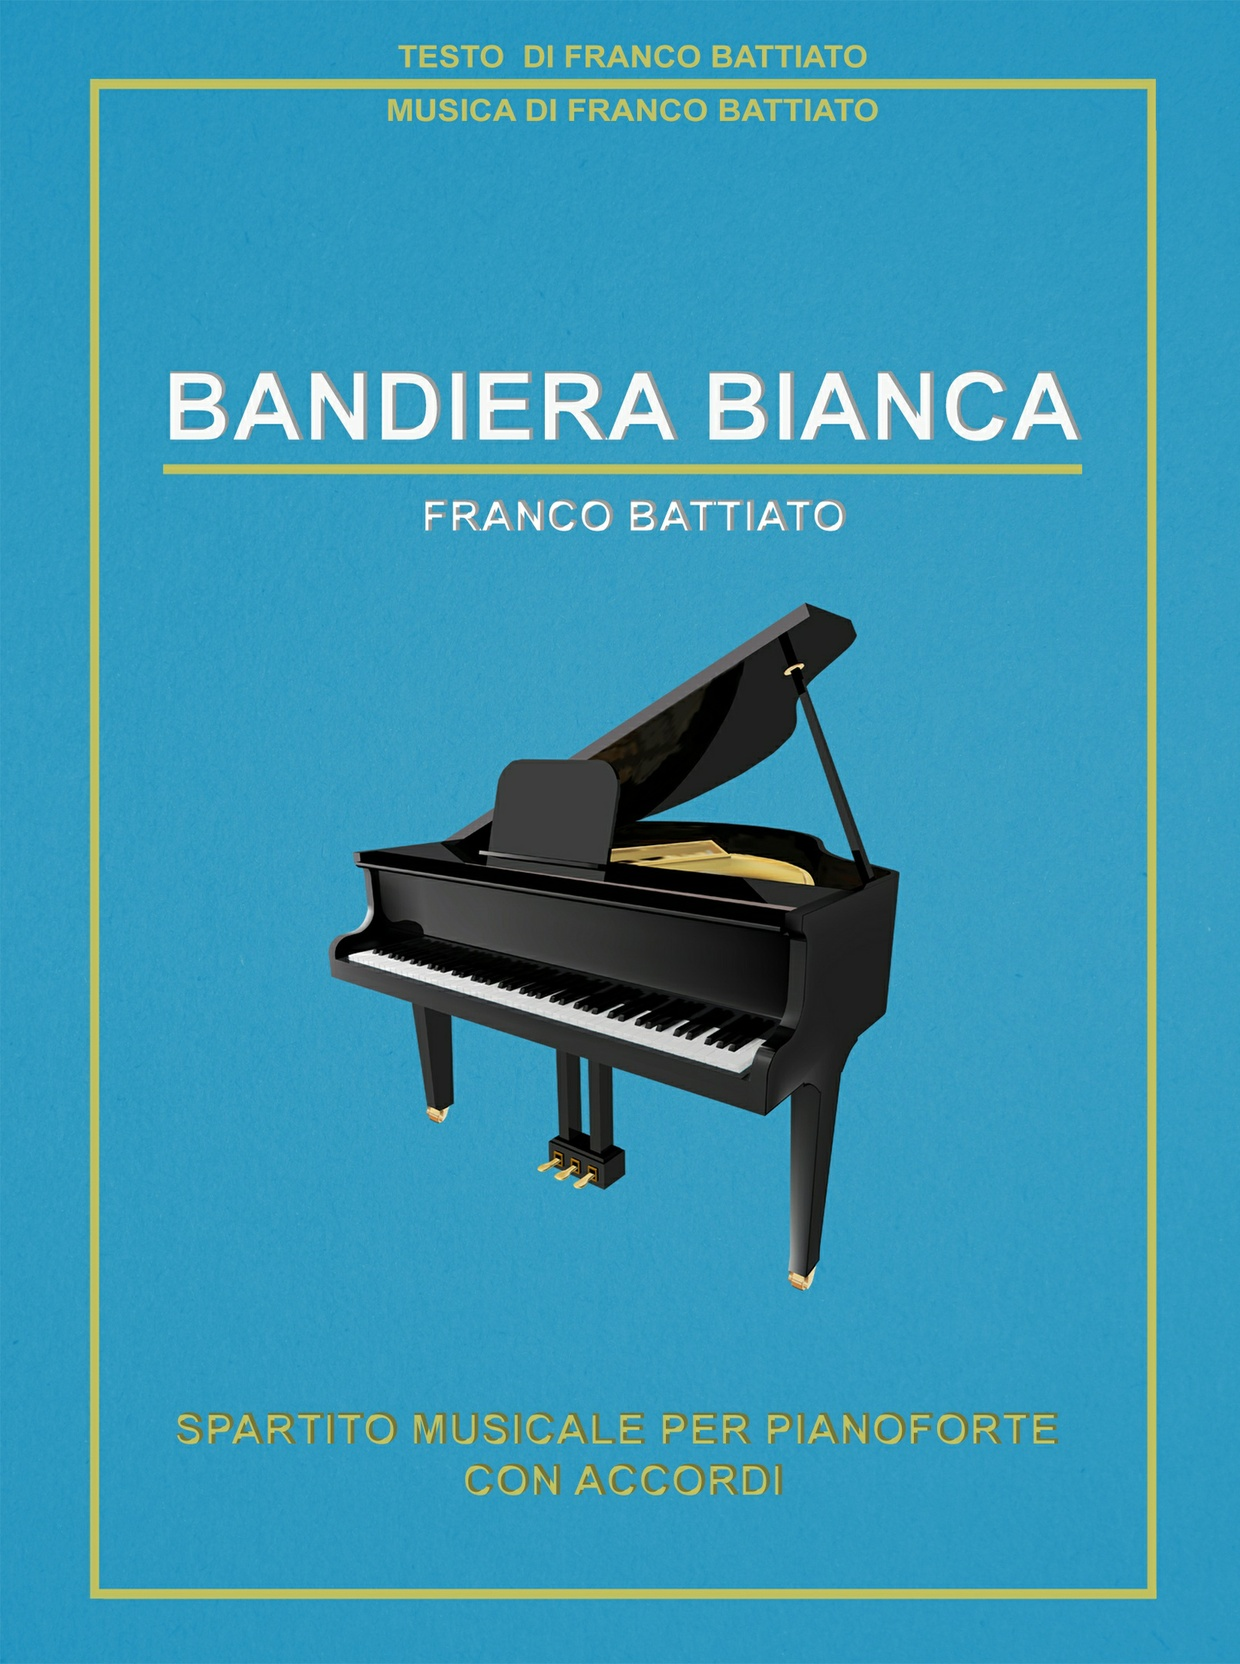 Franco Battiato - Bandiera Bianca